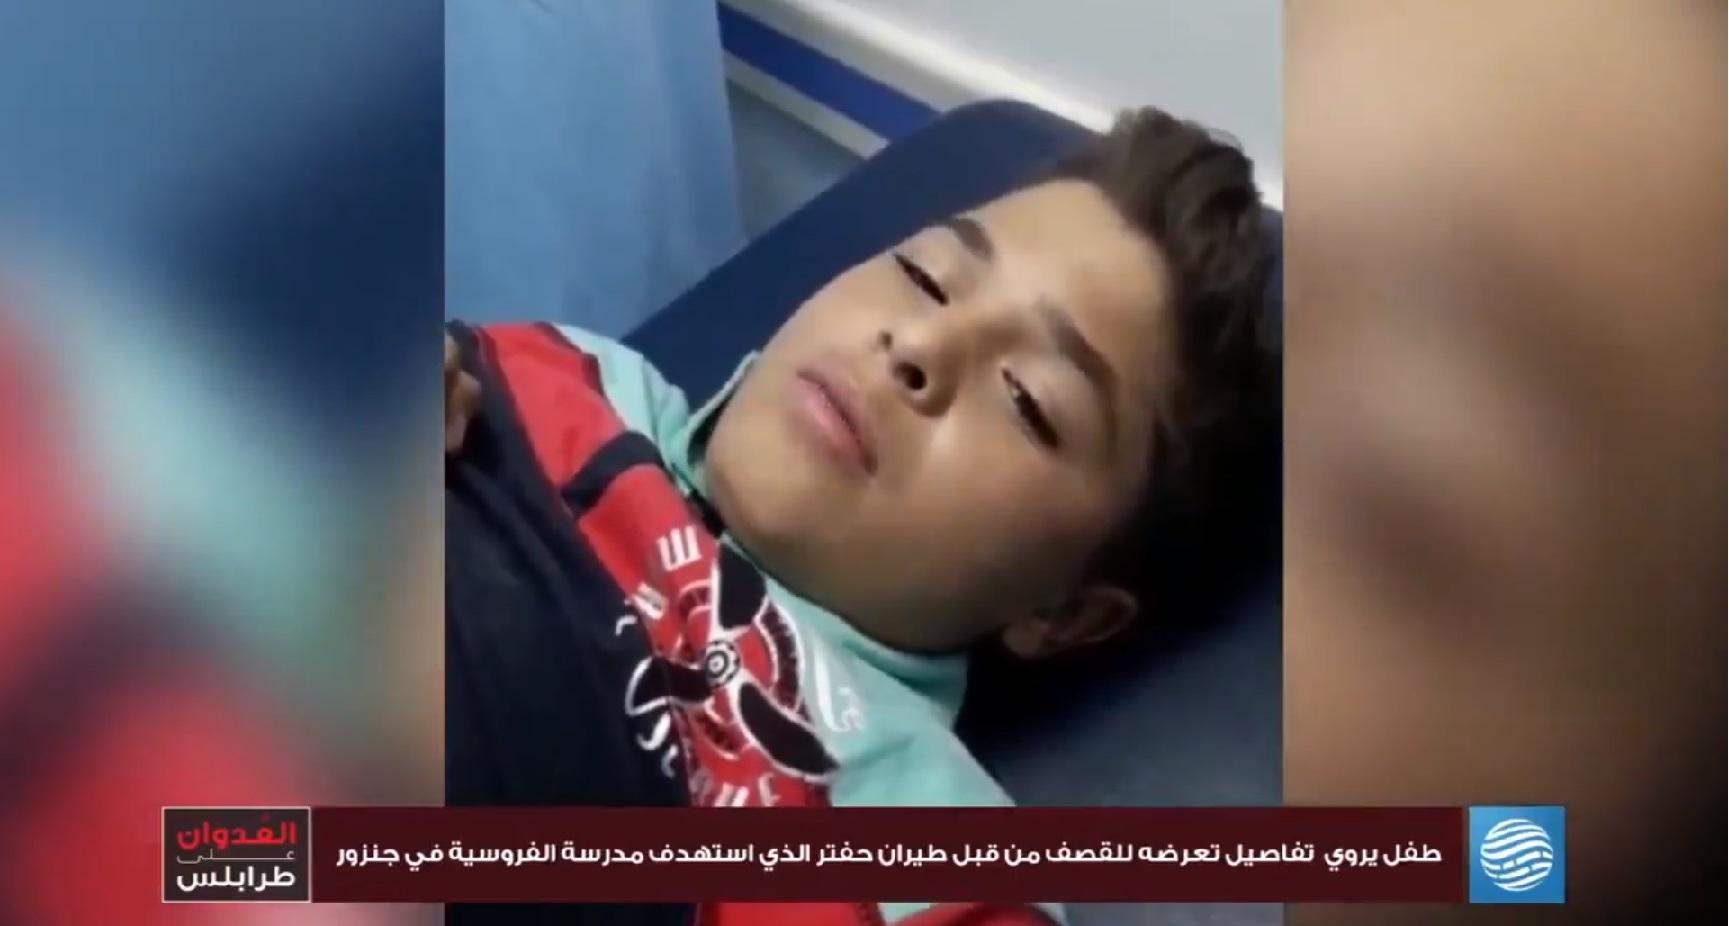 UN condemns Haftar attack on children's riding school in Libya